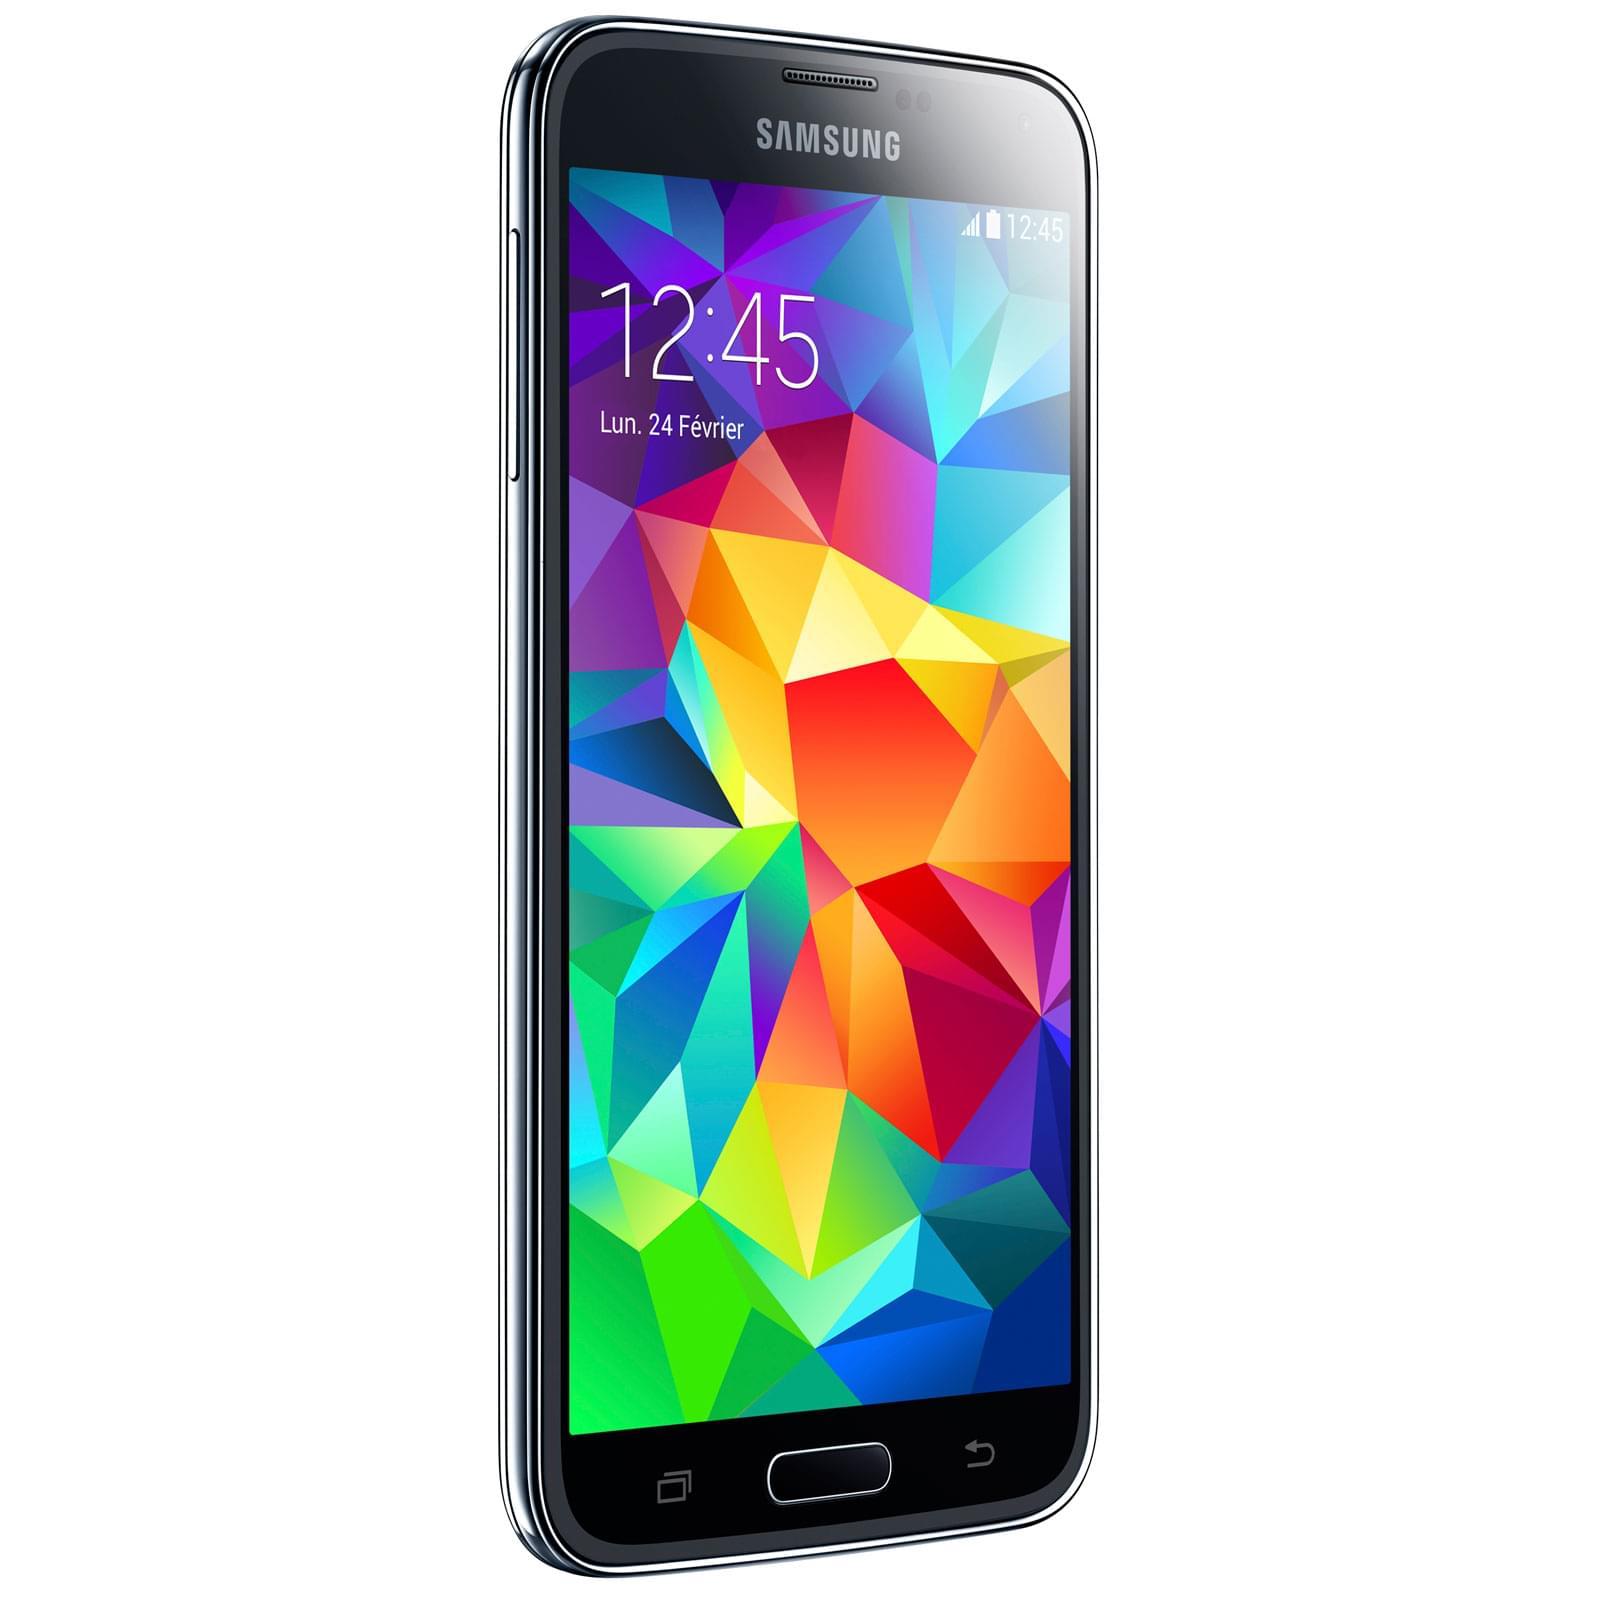 Samsung Galaxy S5 16Go Noir G900F (SM-G900FZKAXEF) - Achat / Vente Téléphonie sur Cybertek.fr - 0